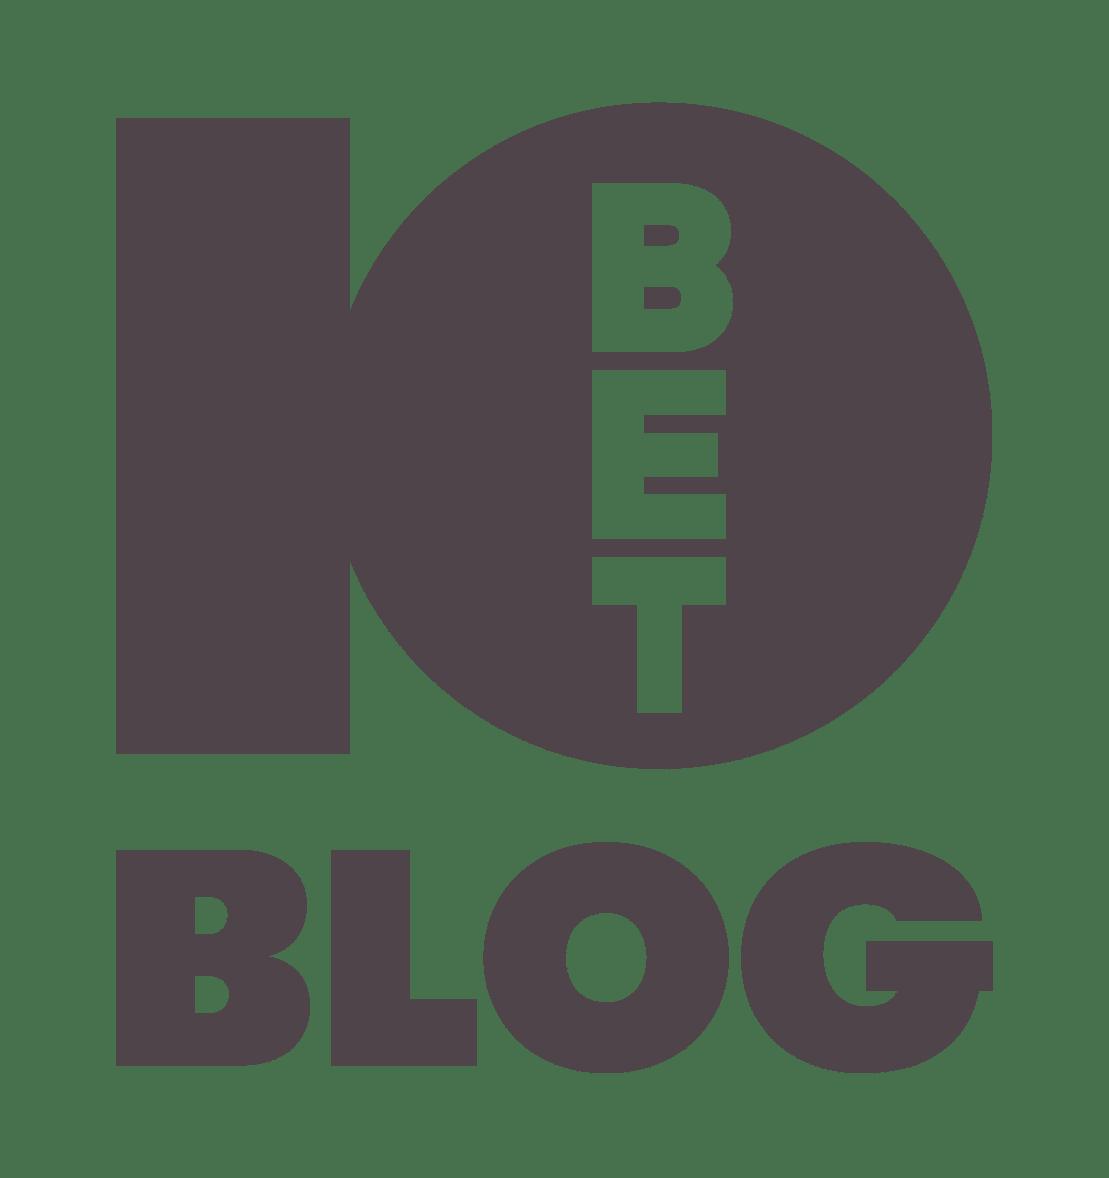 Williams vs kerberos betting expert foot churchill downs twin spires club betting